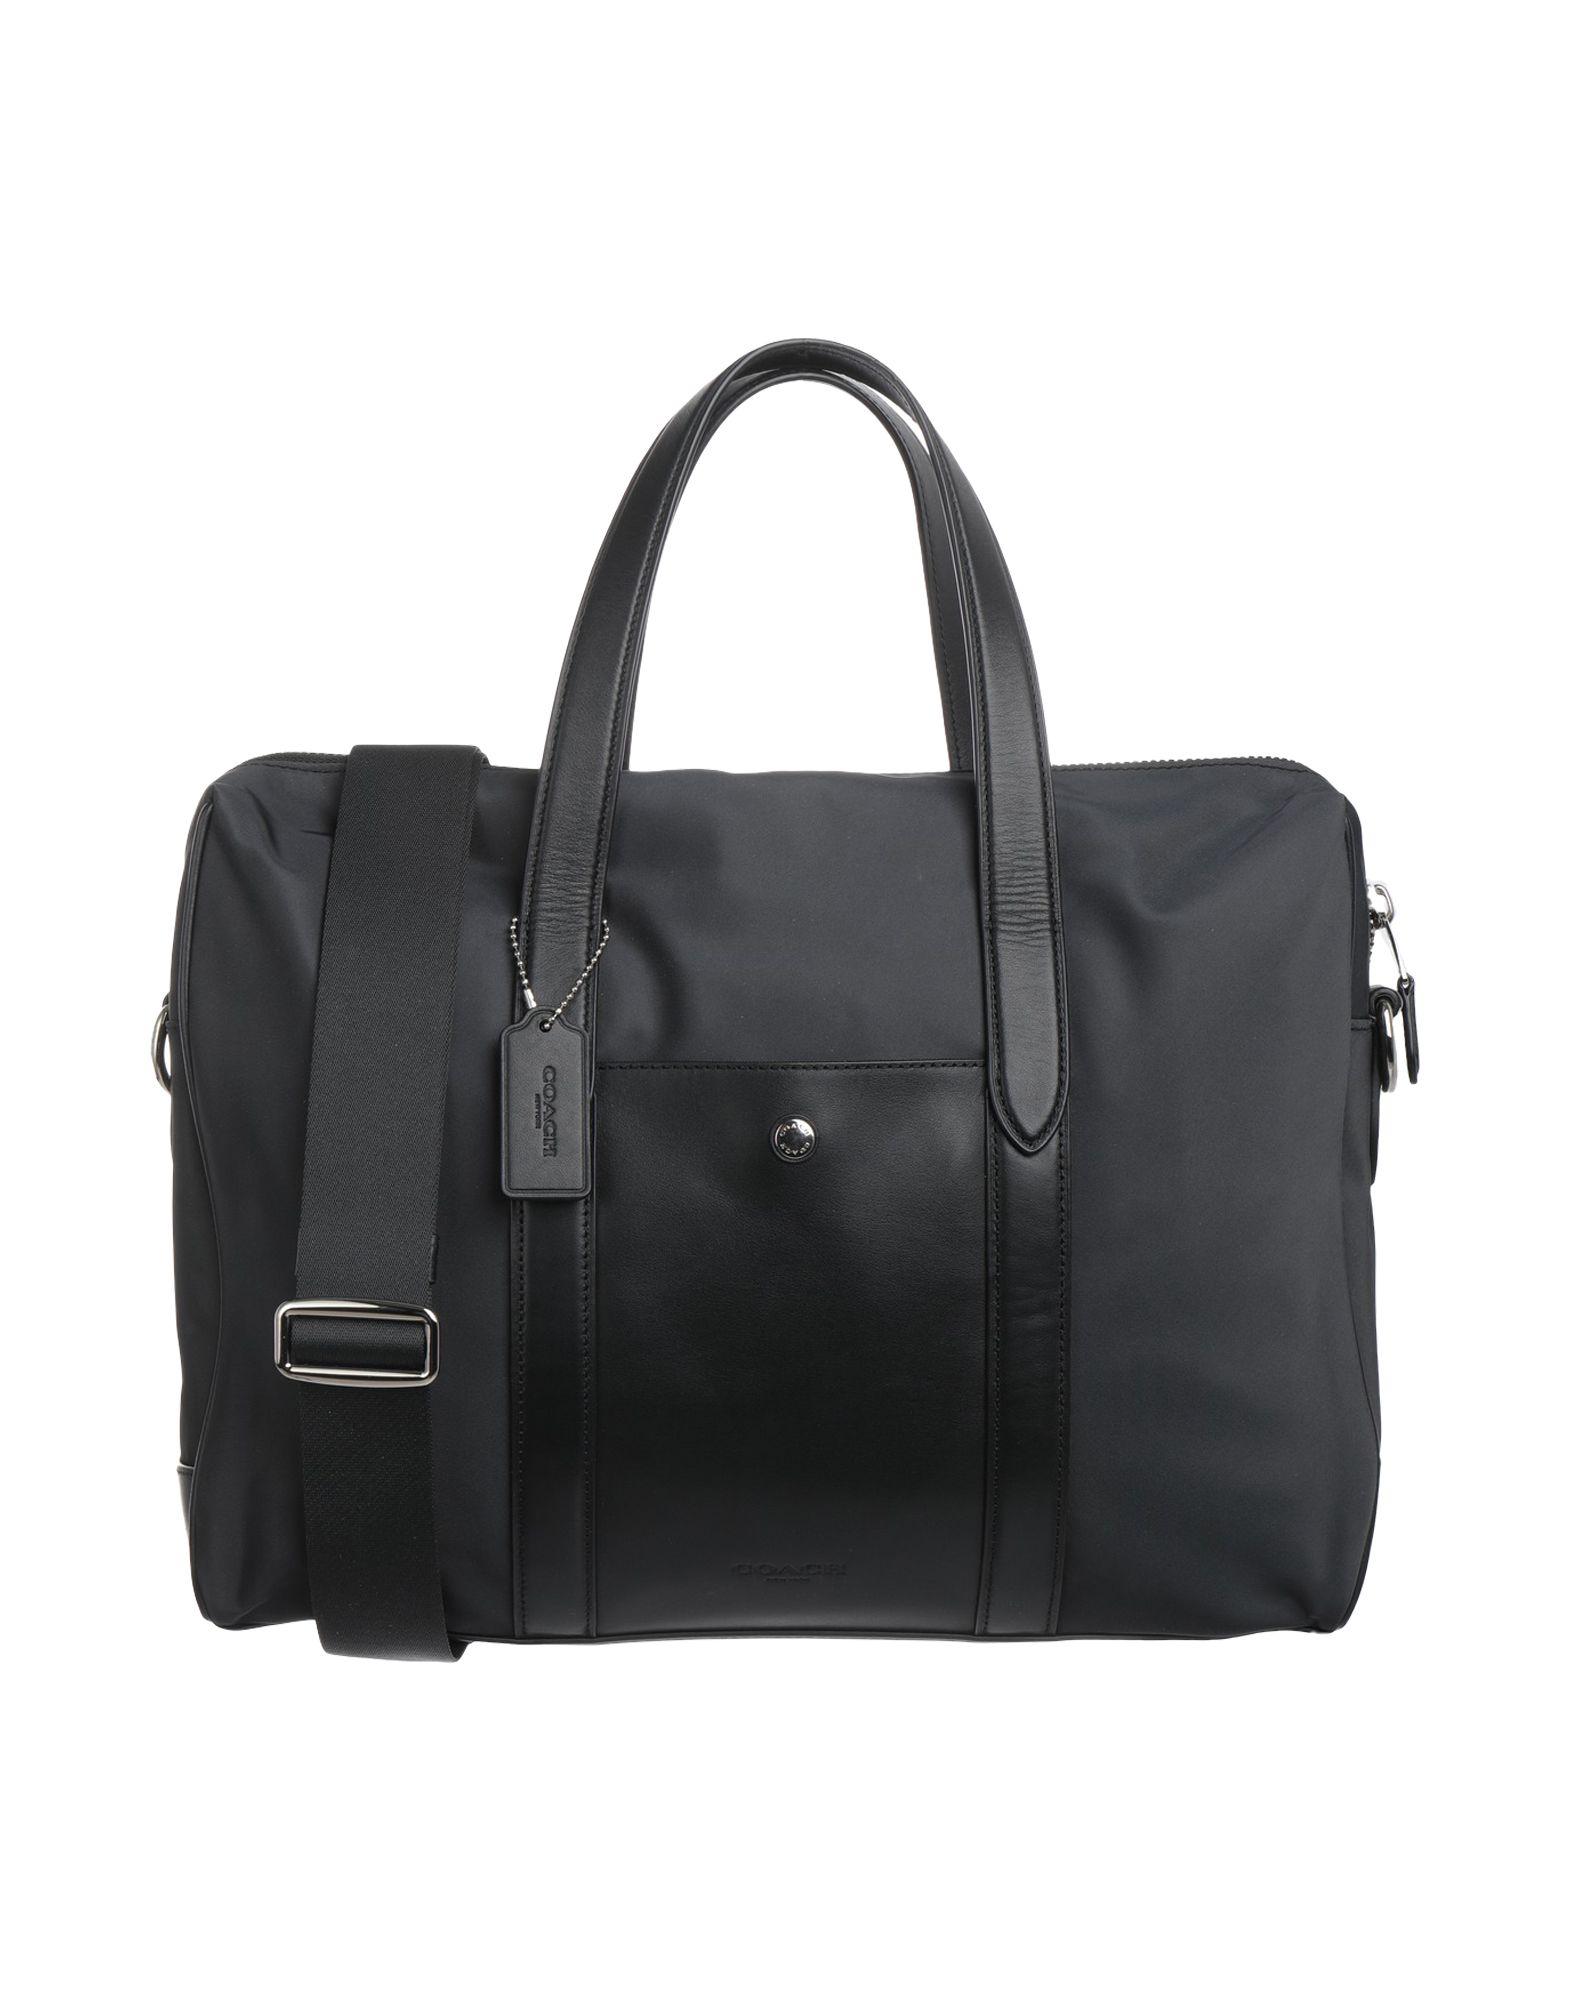 COACH Деловые сумки coach сумки магазин в москве